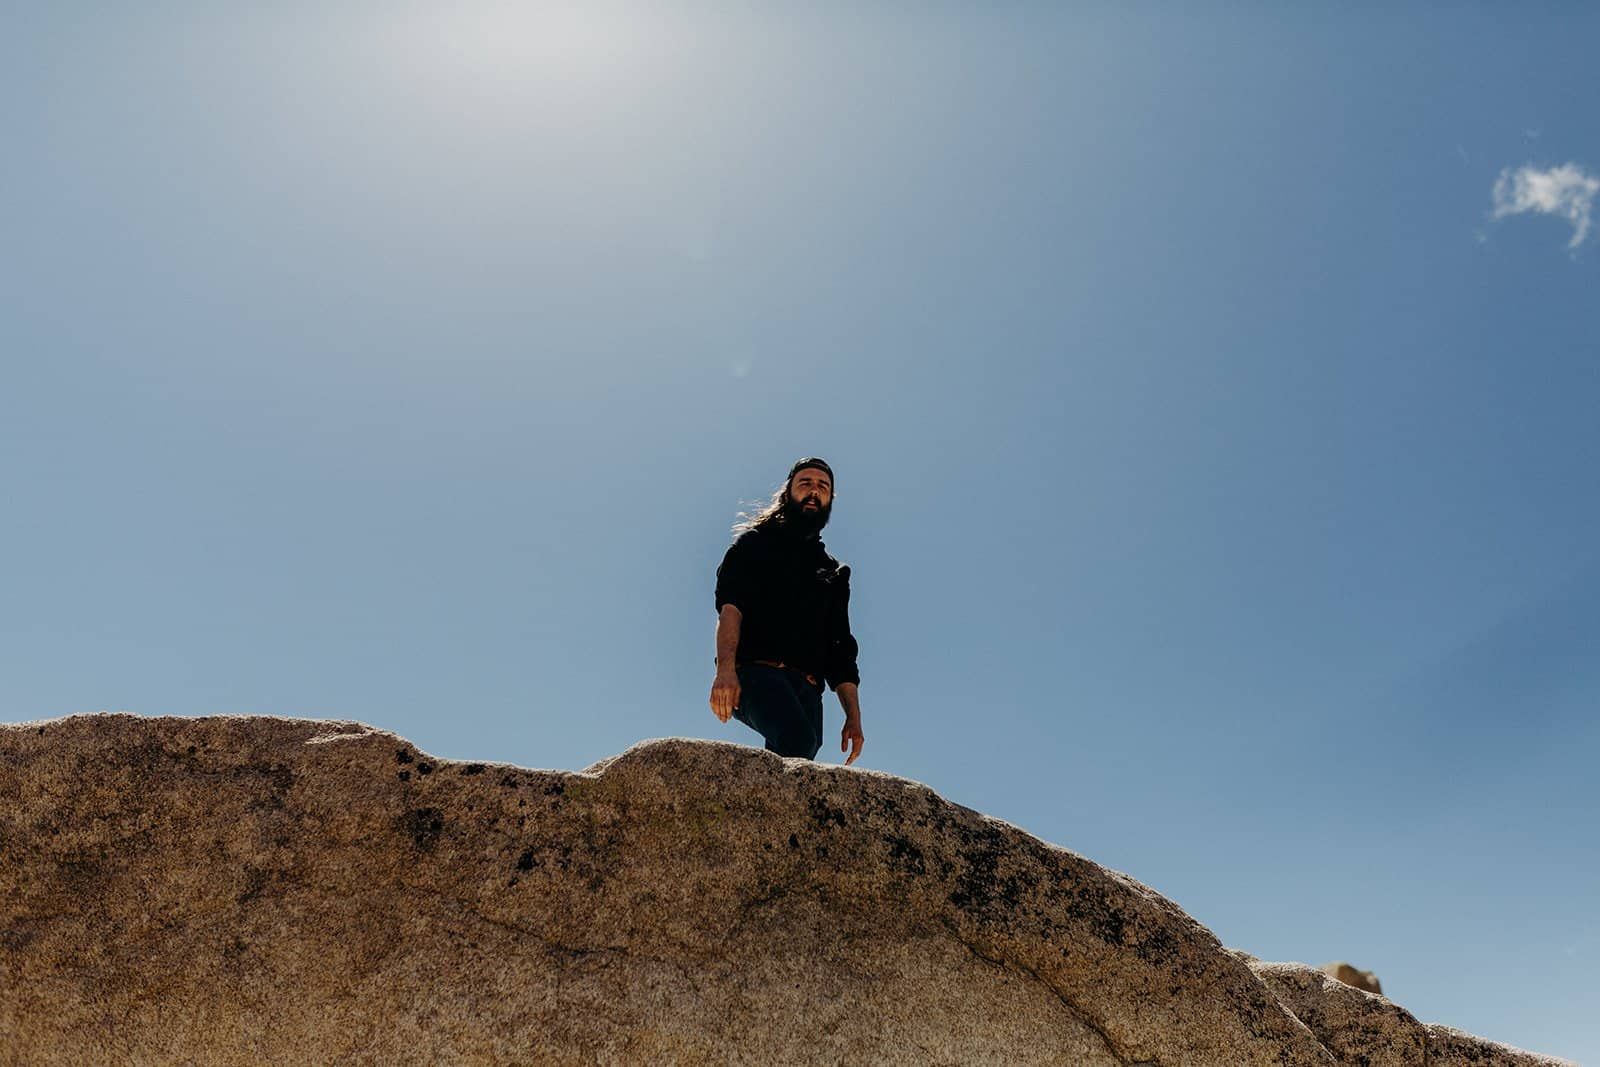 man climbing boulders in Joshua Tree National Park